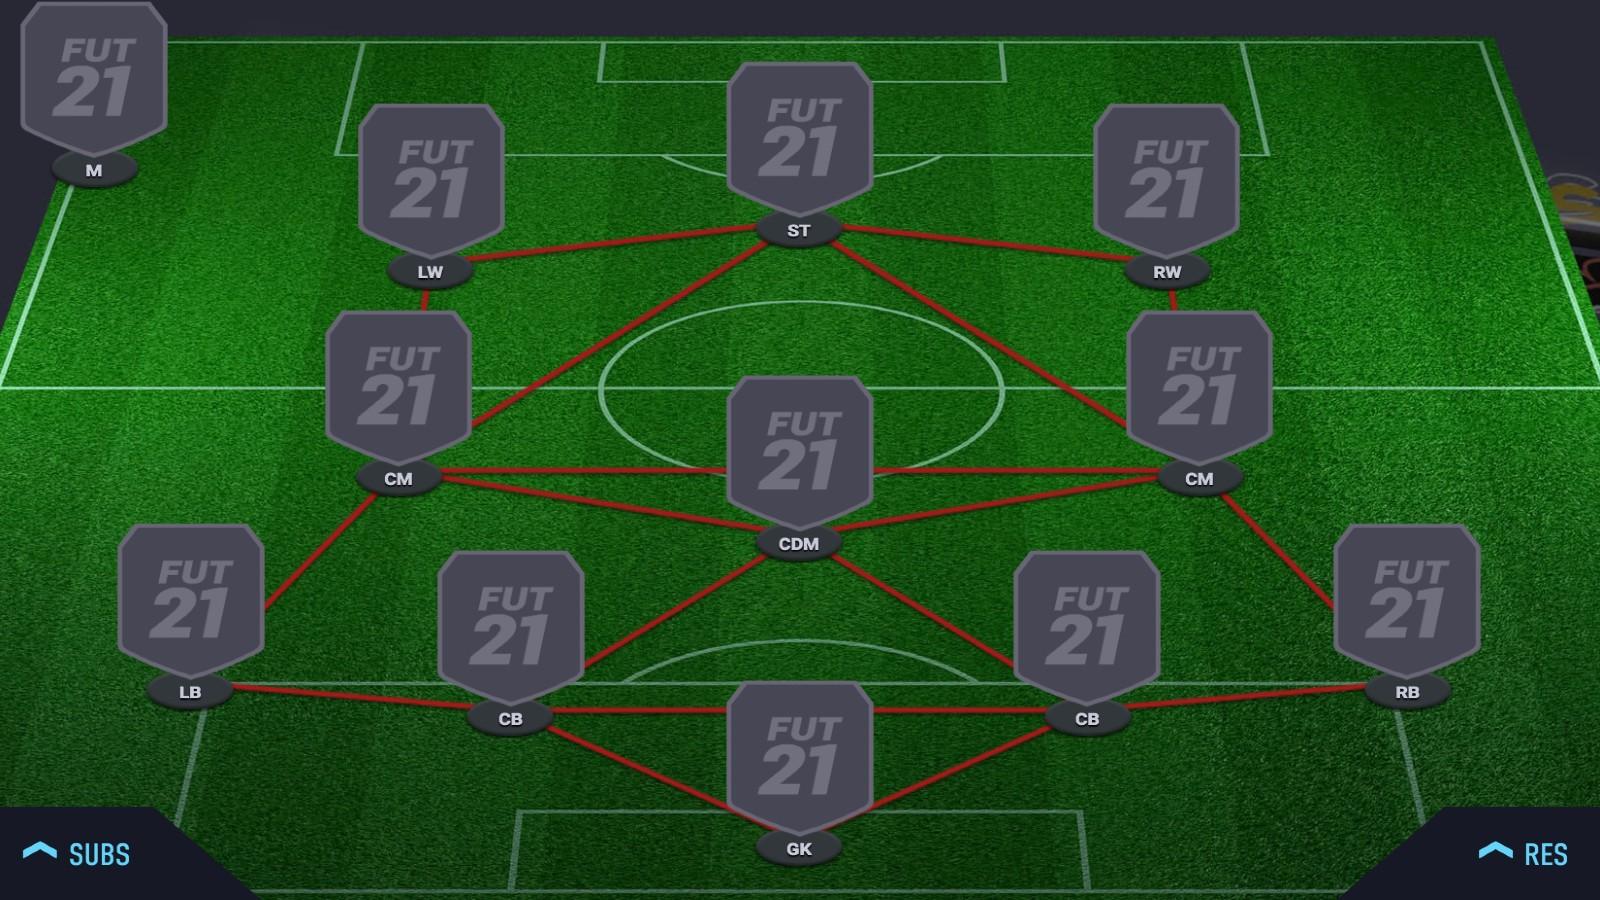 FIFA 21 Formation 433